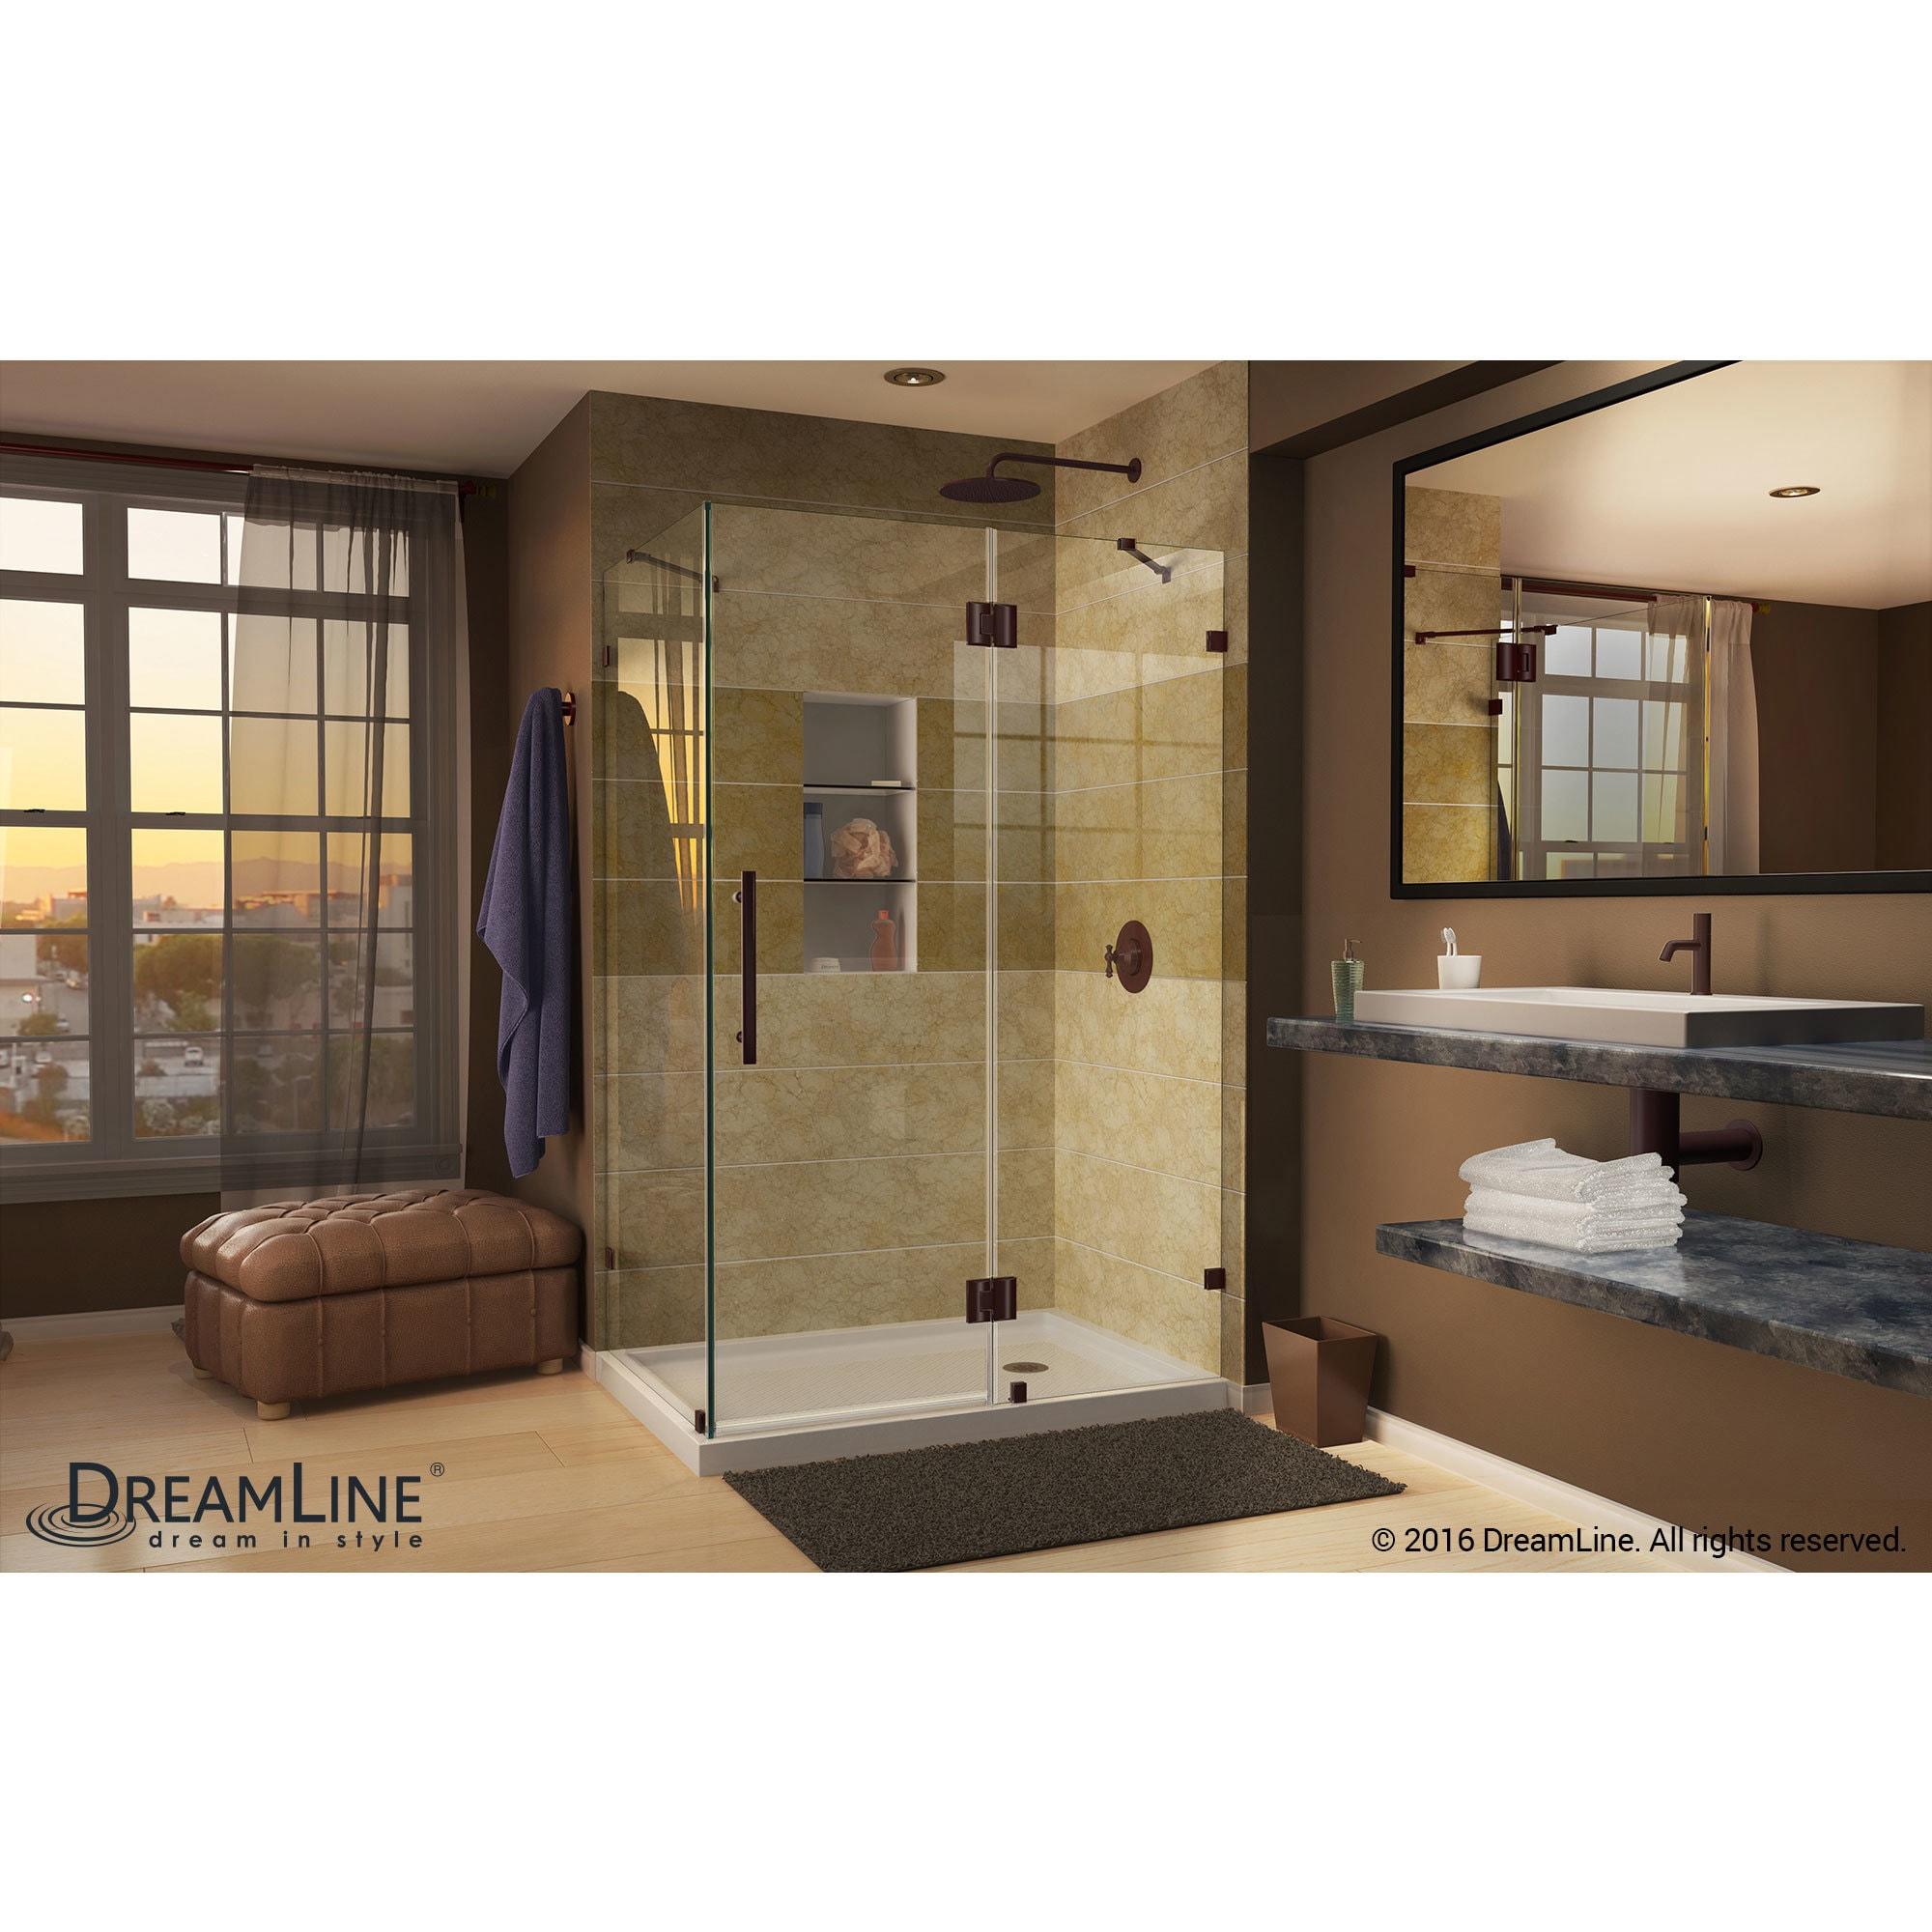 Shop DreamLine Quatra Lux 34 5/16 in. by 46 5/16 in. Frameless ...